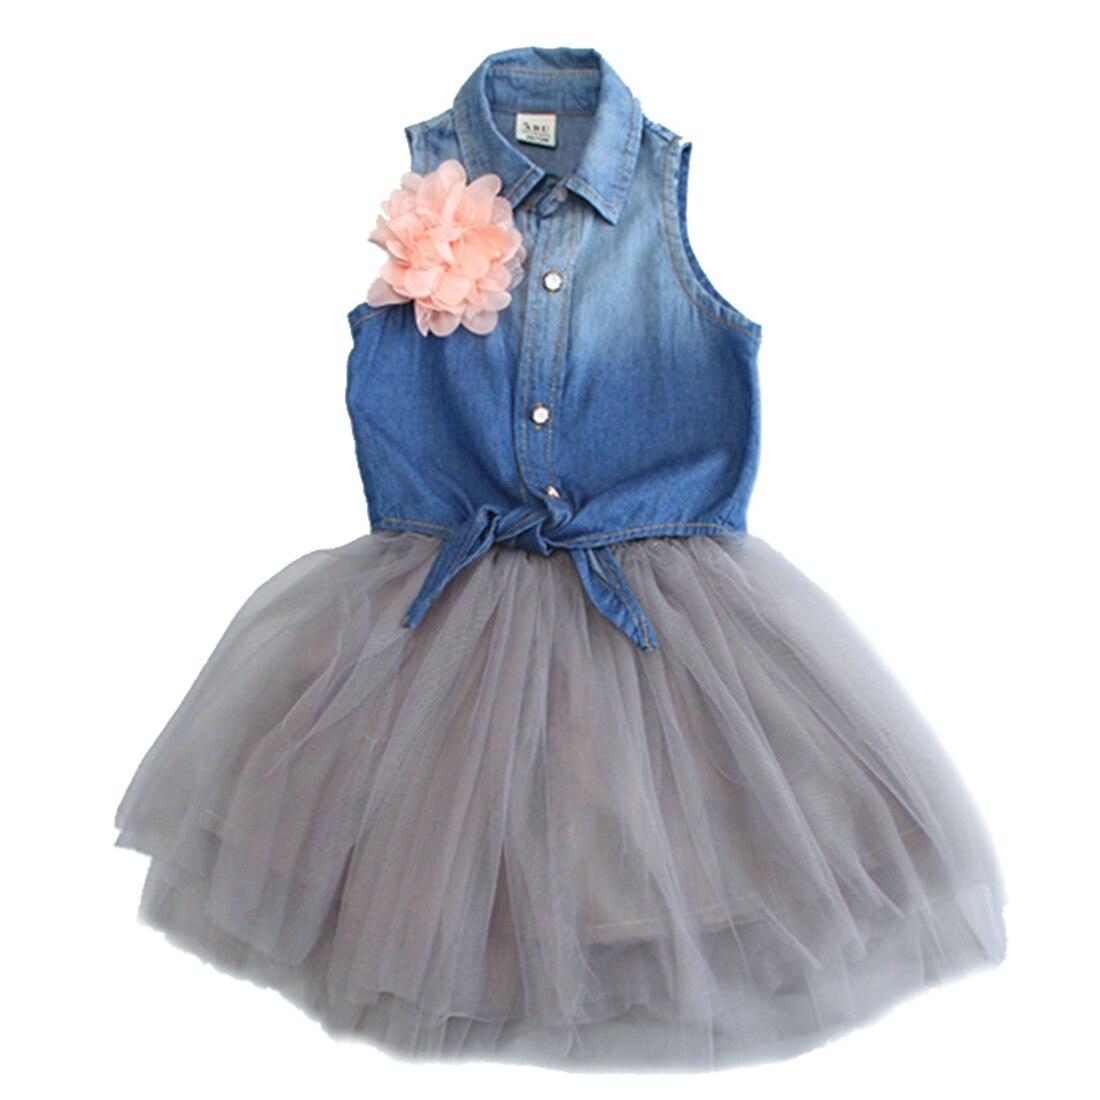 2 Pcs Summer Kids Baby Girl Denim Flower Vest Tops Gauze TuTu Skirts Outfit